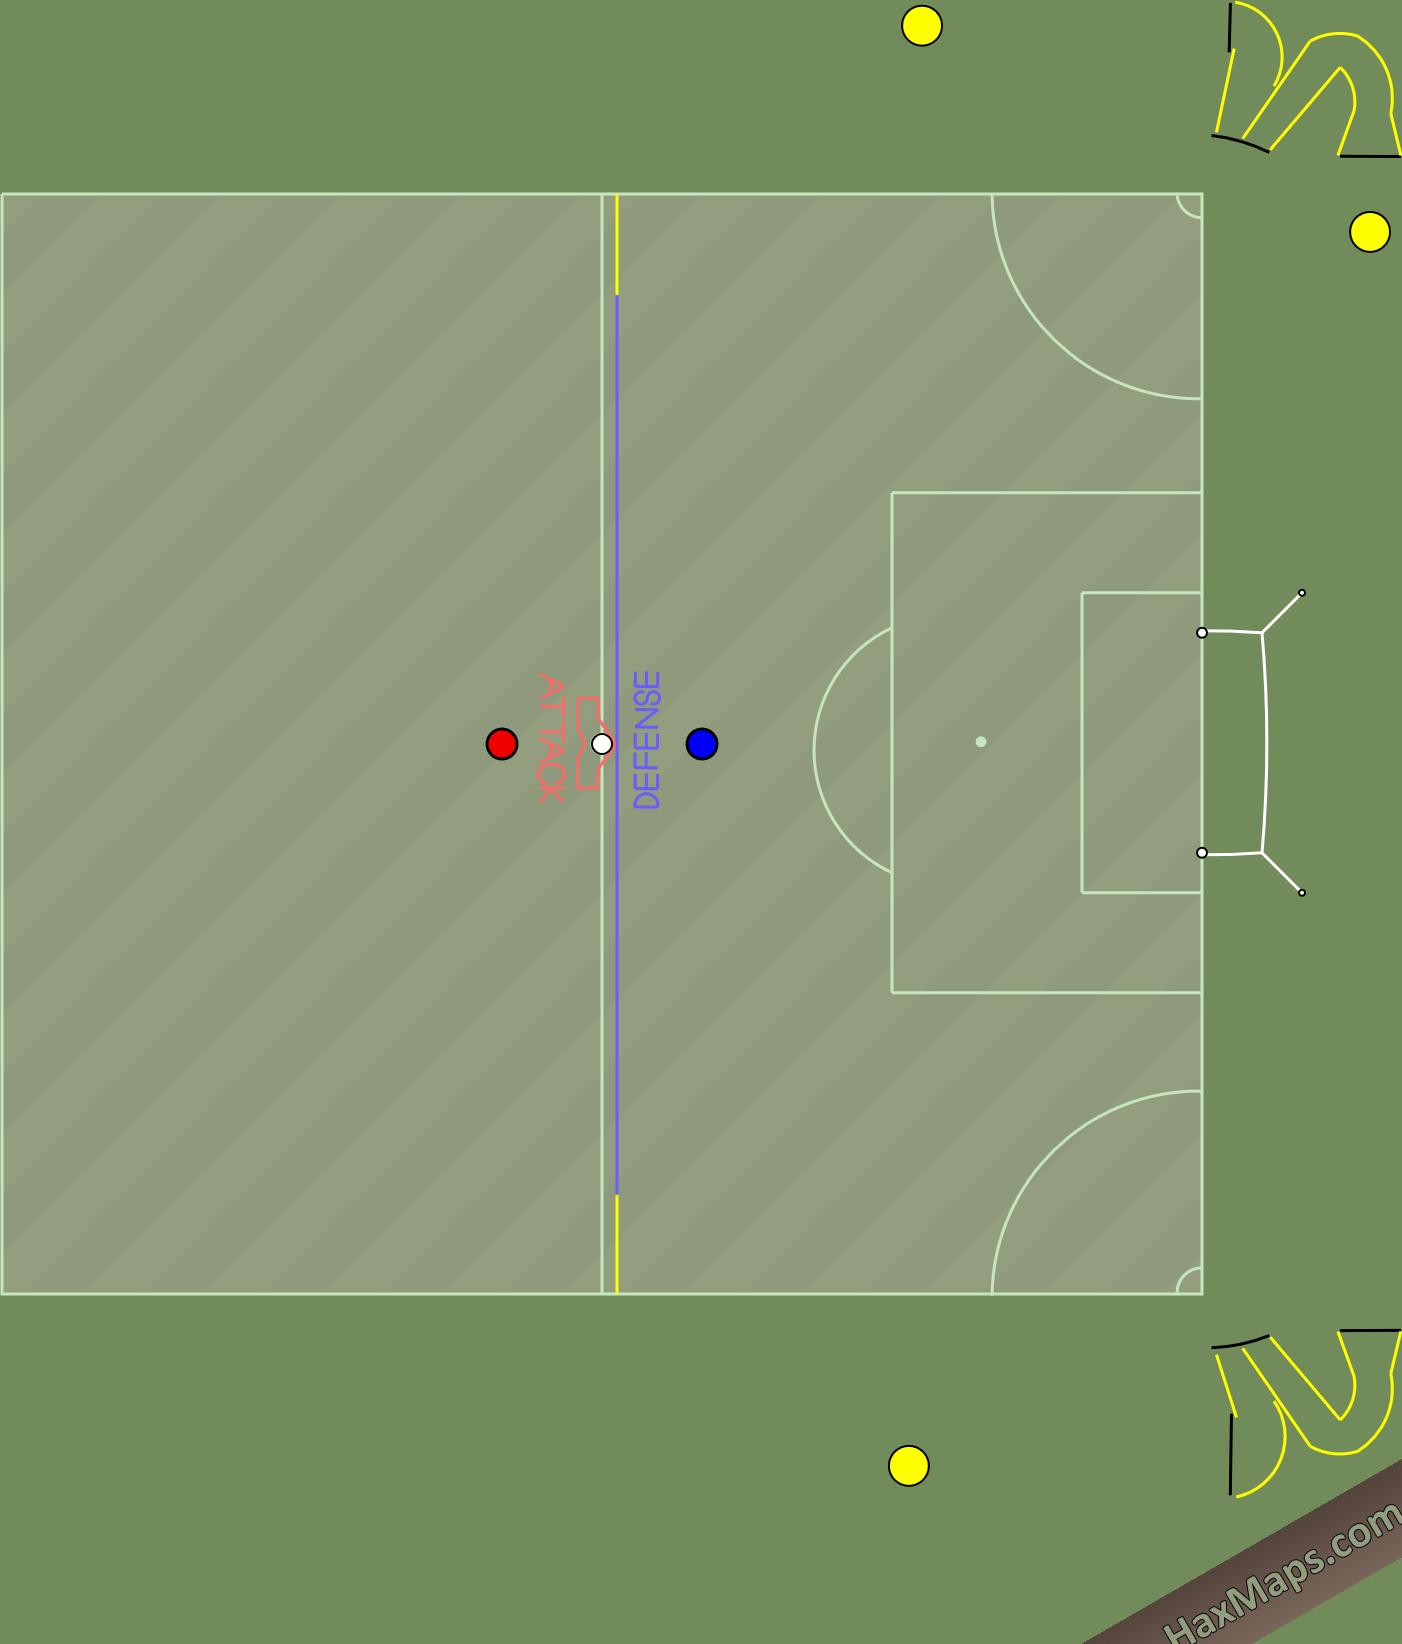 hax ball maps | RS-corner practice.-half